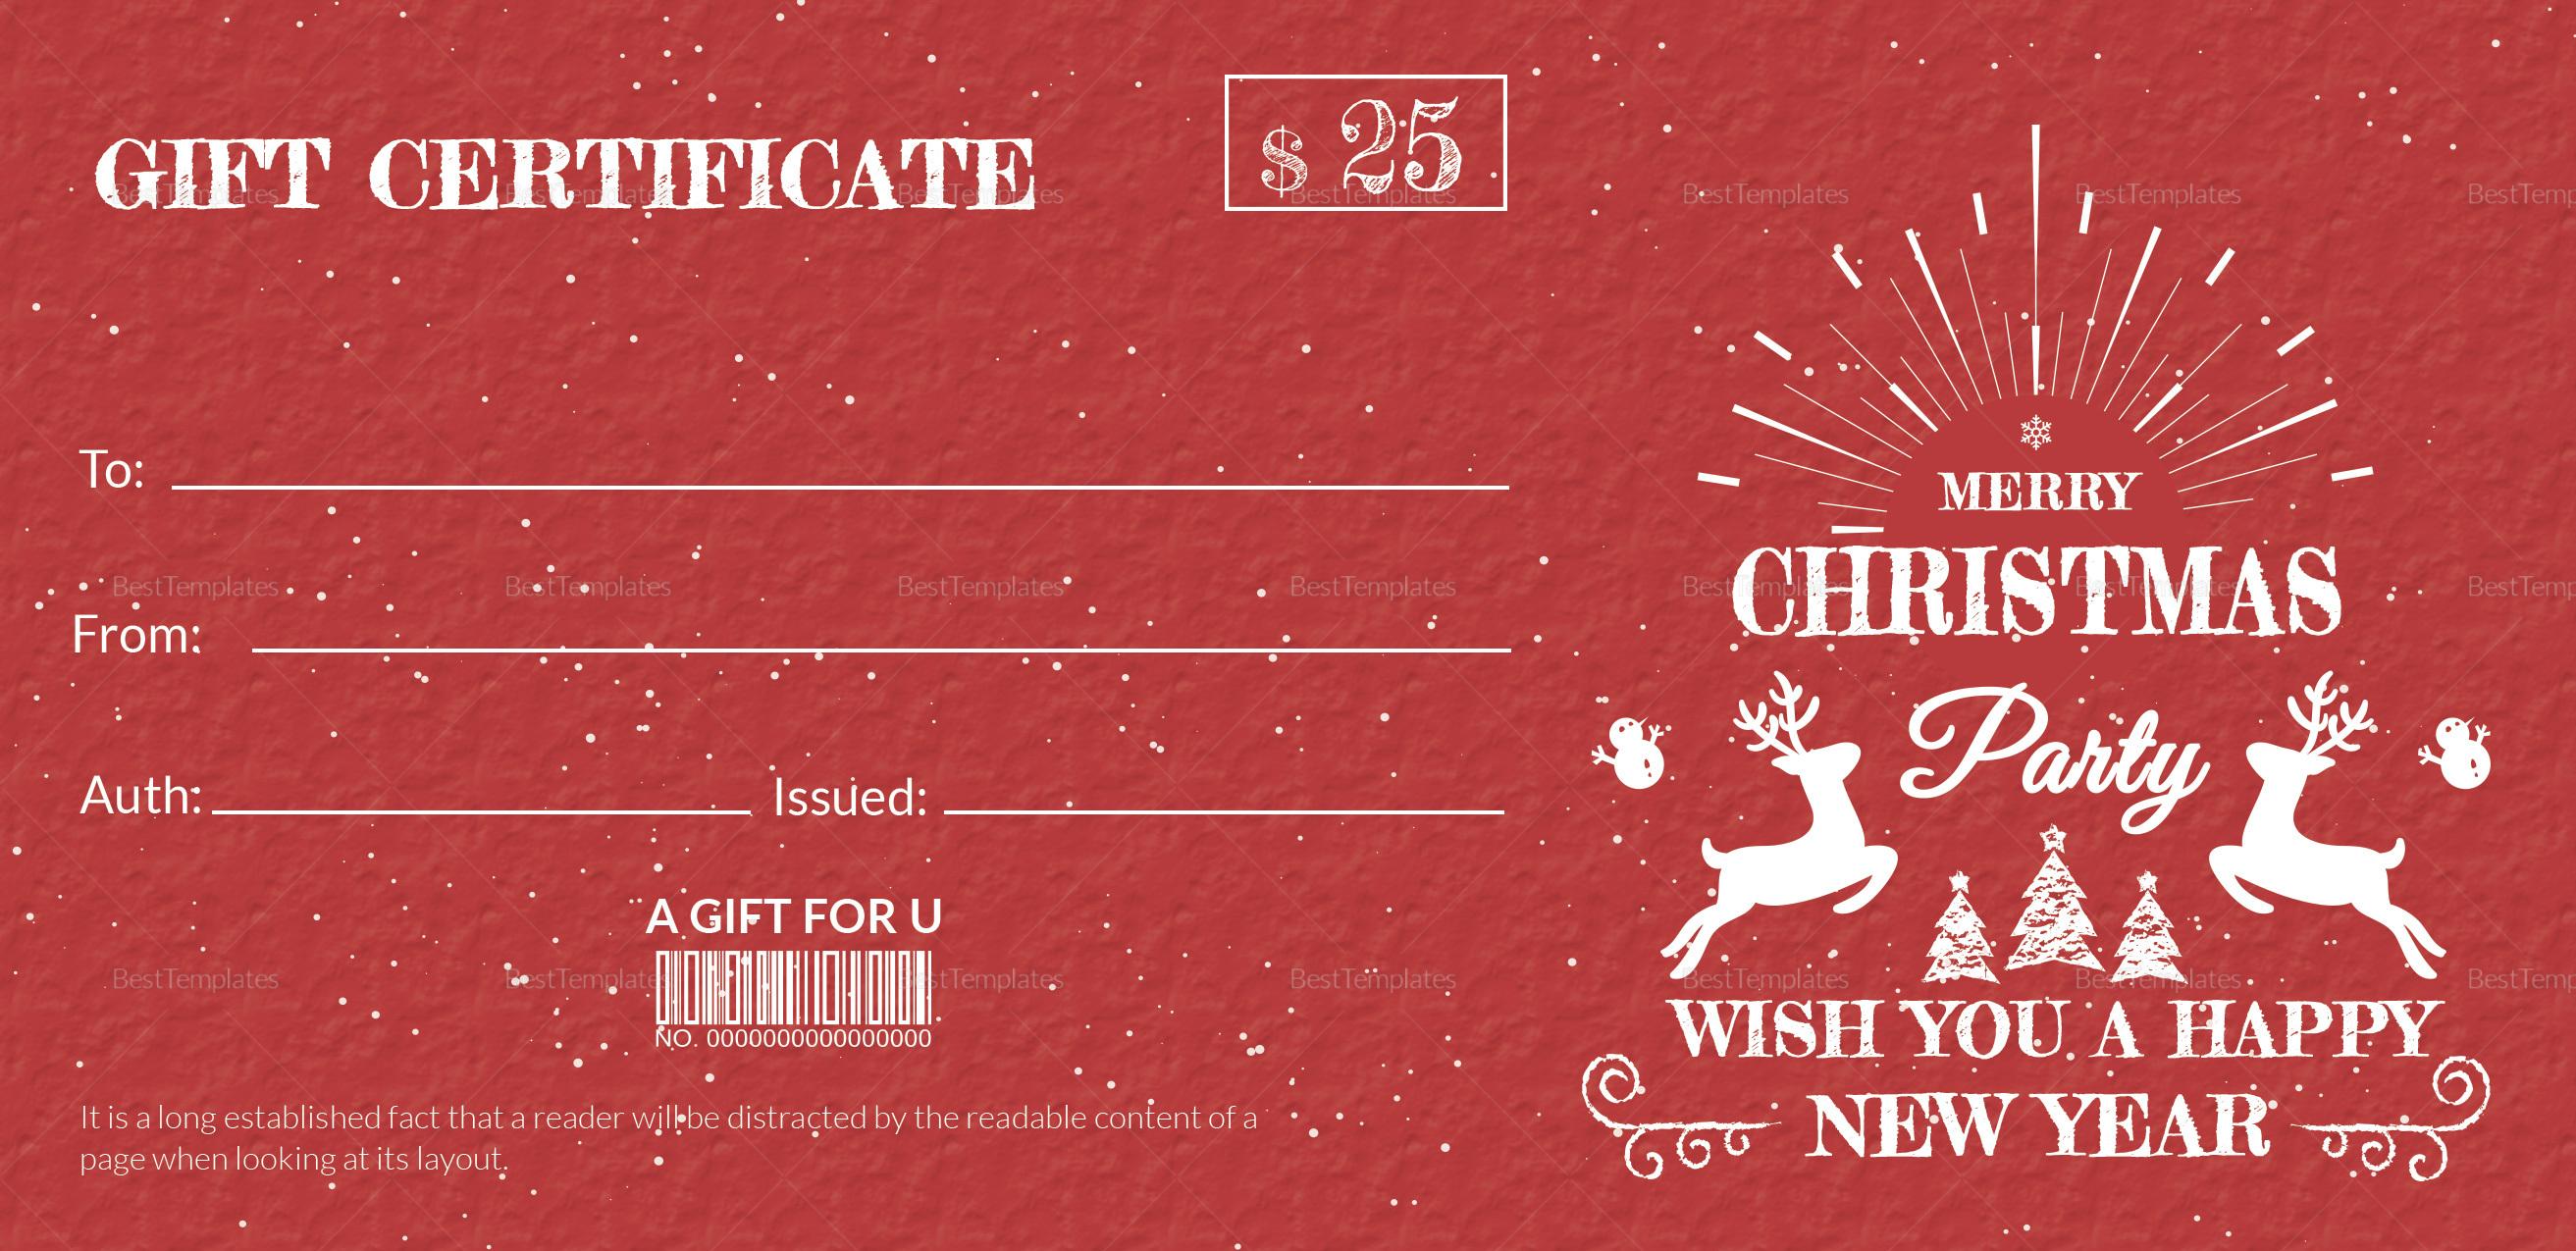 Christmas Celebration Gift Certificate